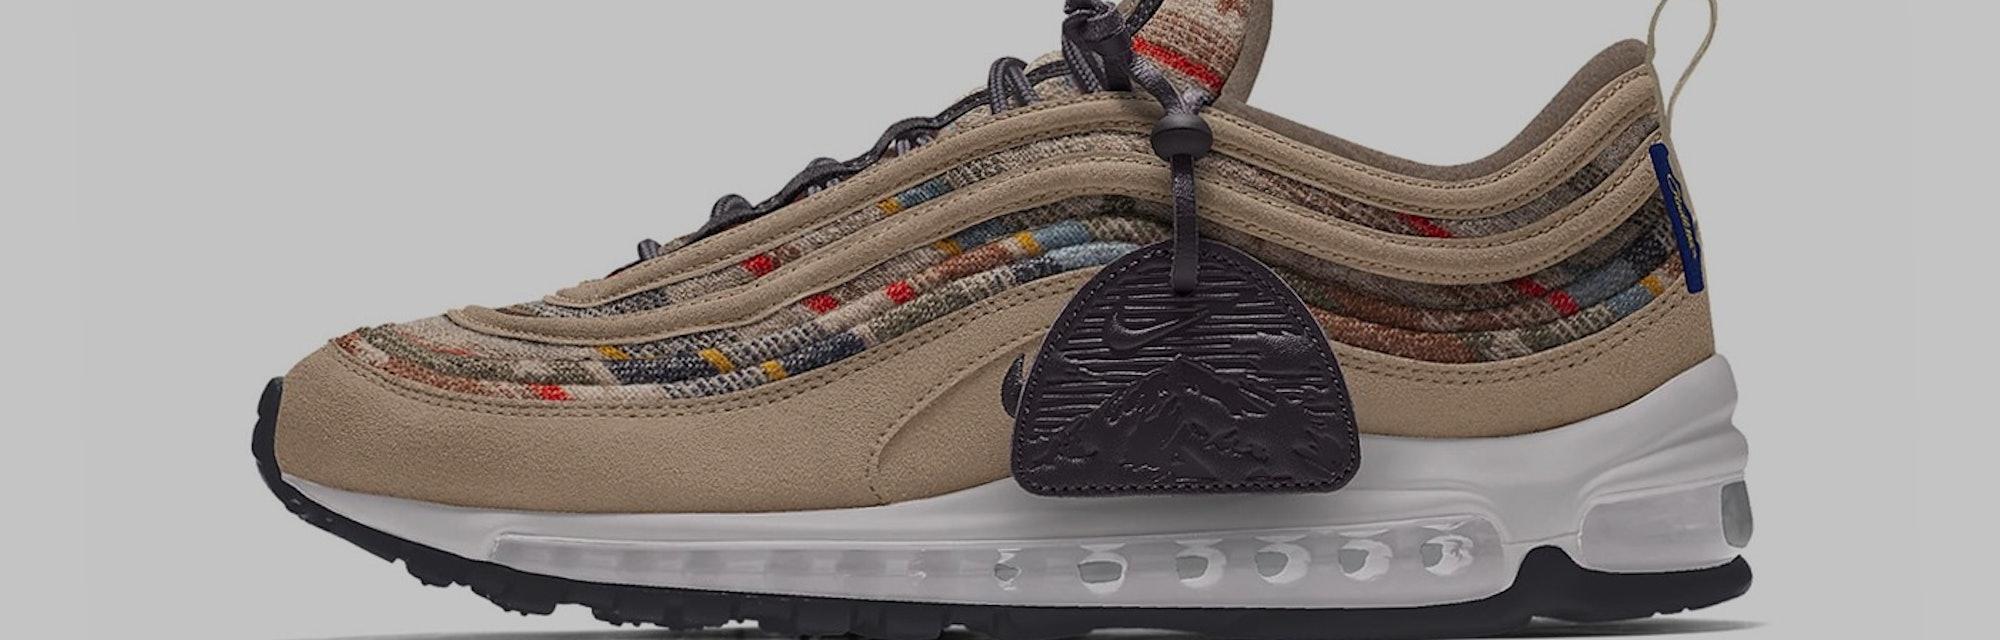 Nike By You Pendleton Air Max 97